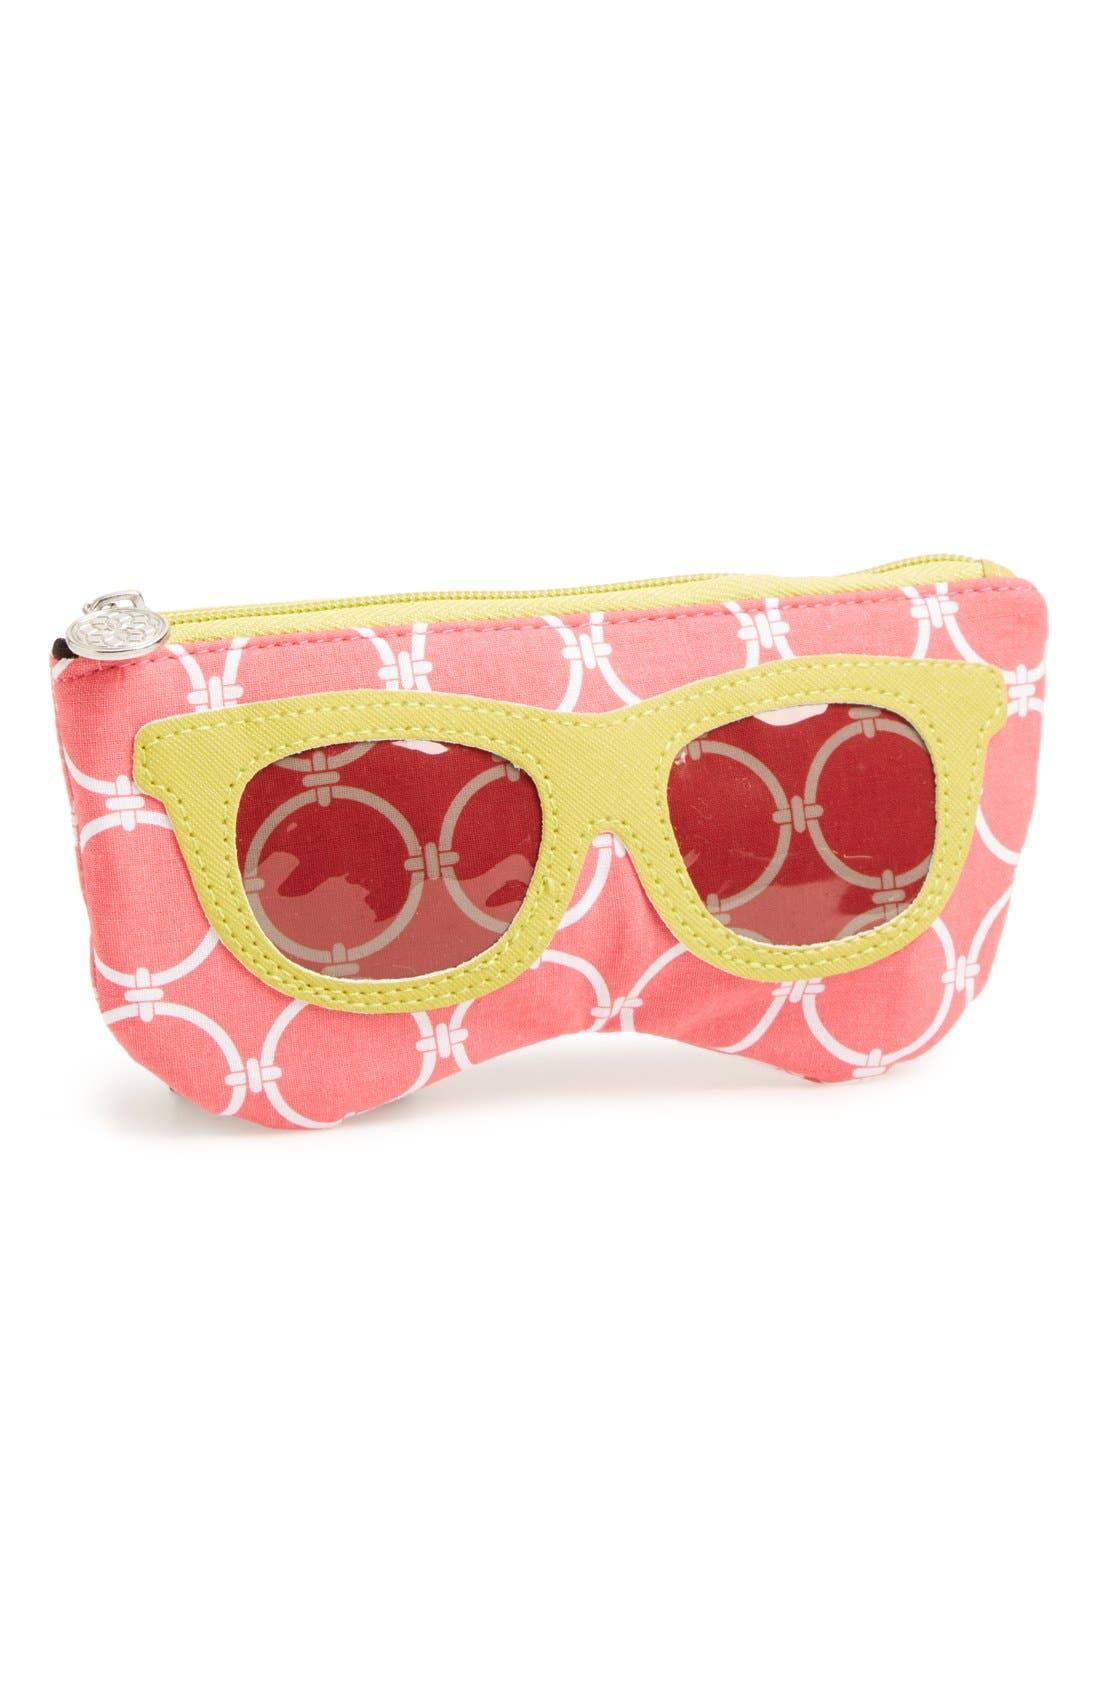 Alternate Image 1 Selected - Tri-Coastal Design Sunglasses Case